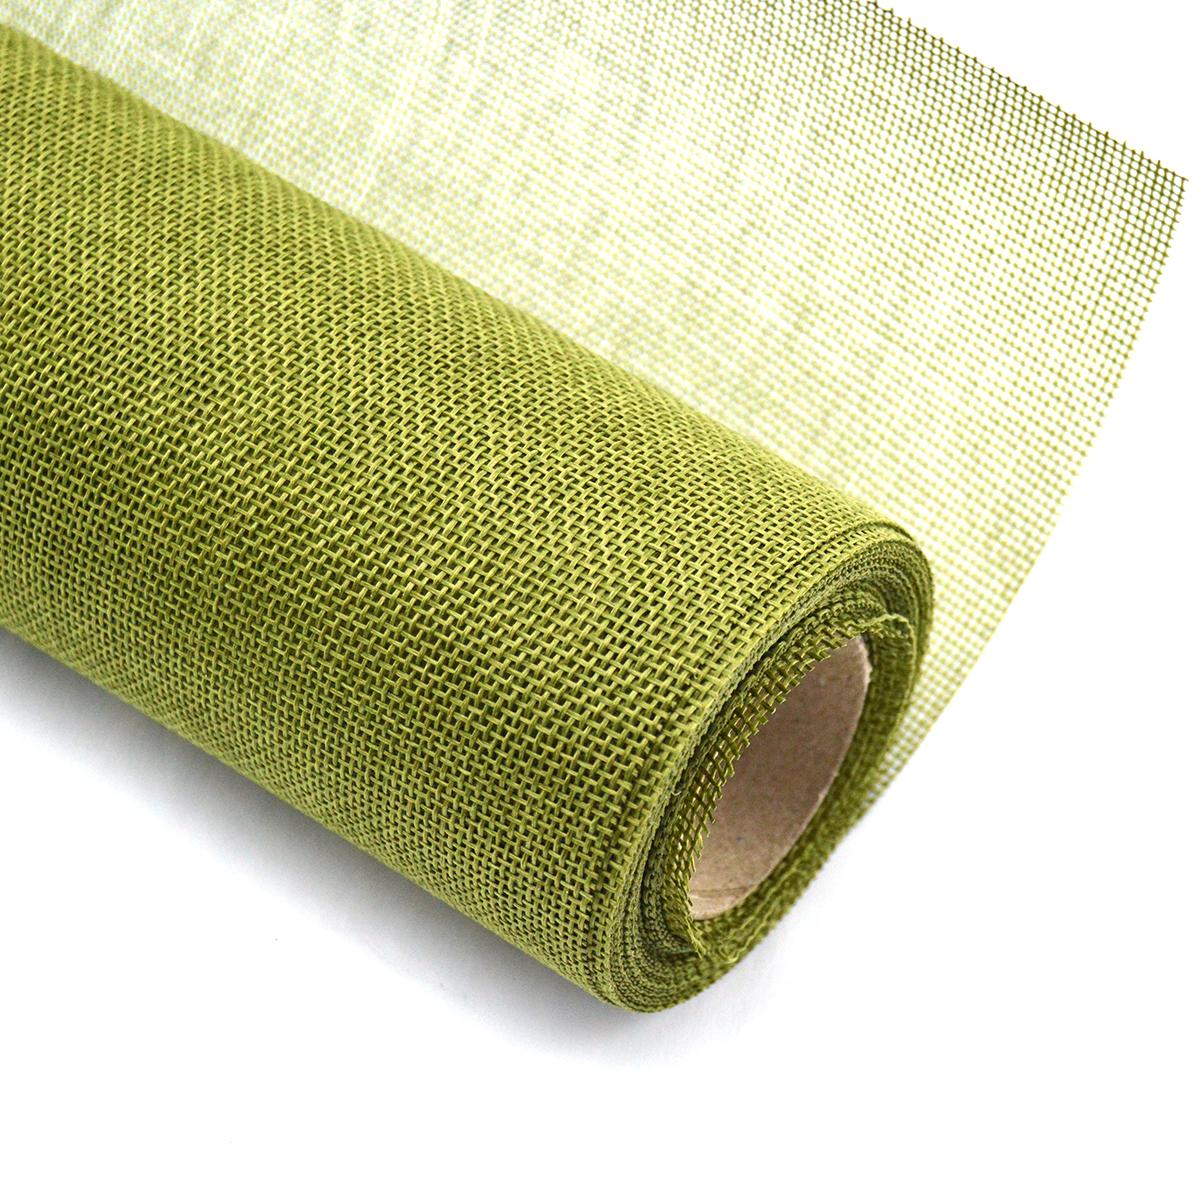 Plasa Sac Verde